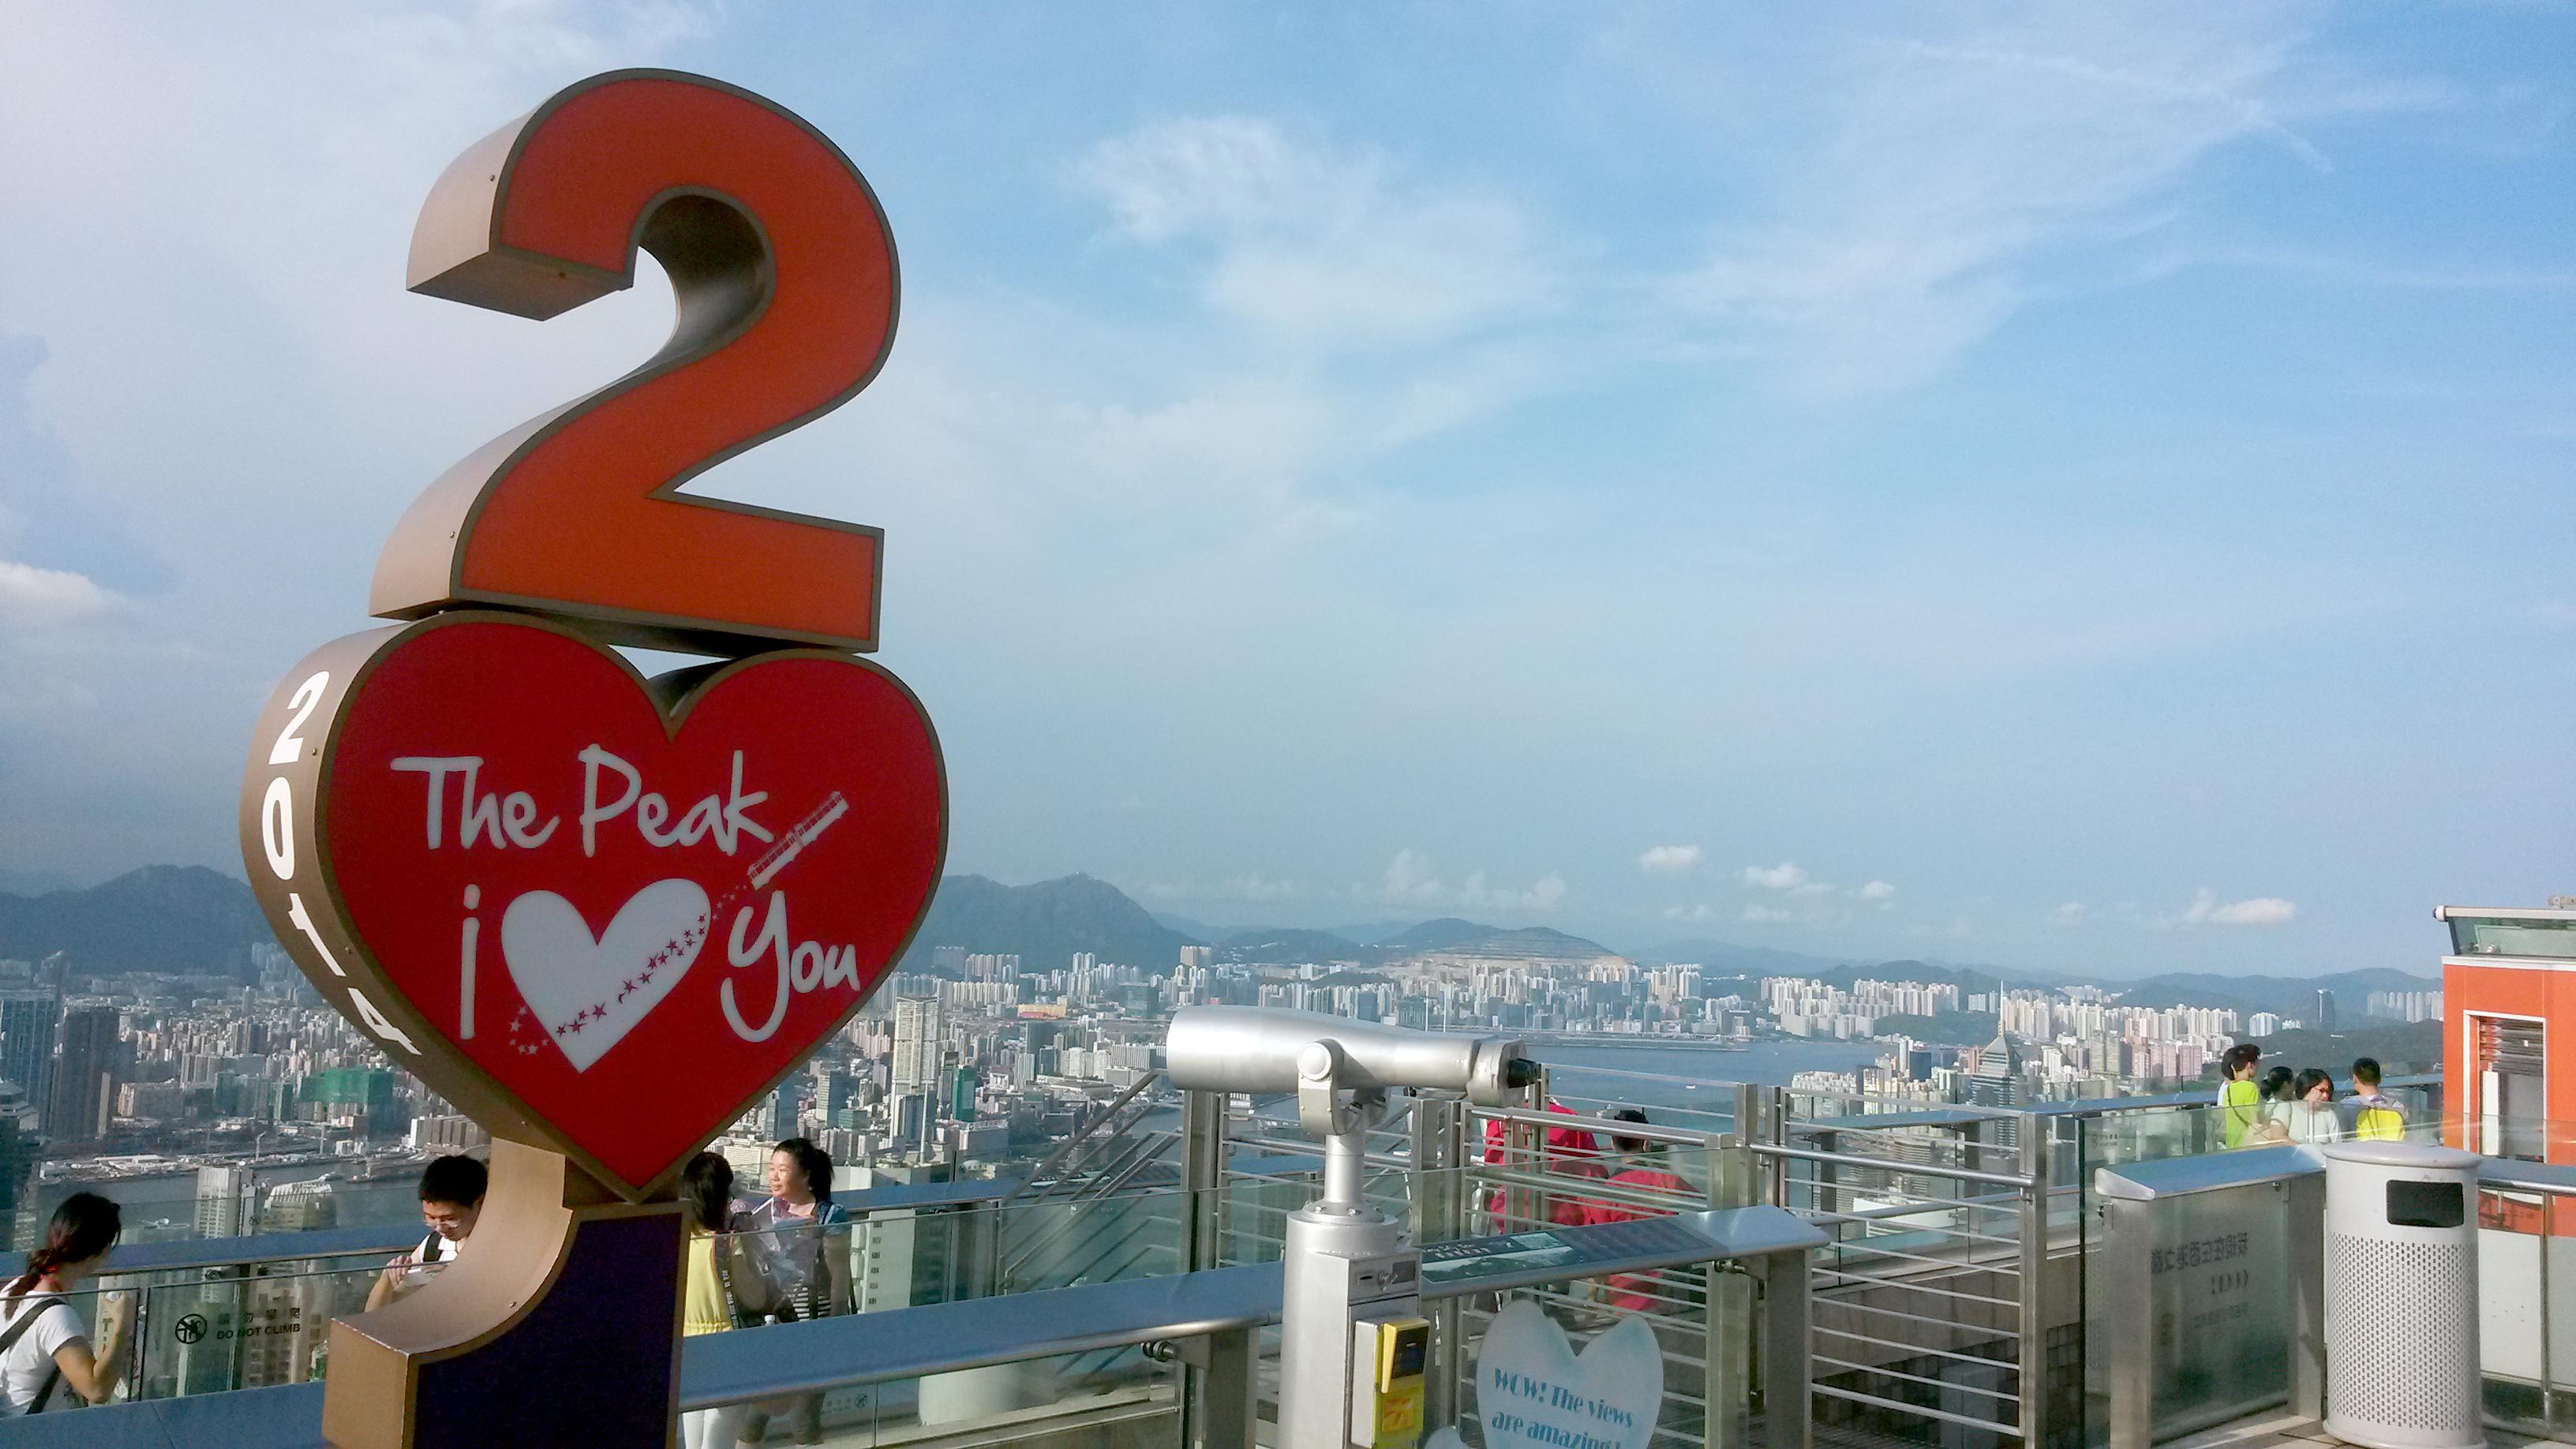 The Peak — Hong Kong's highest vantage point